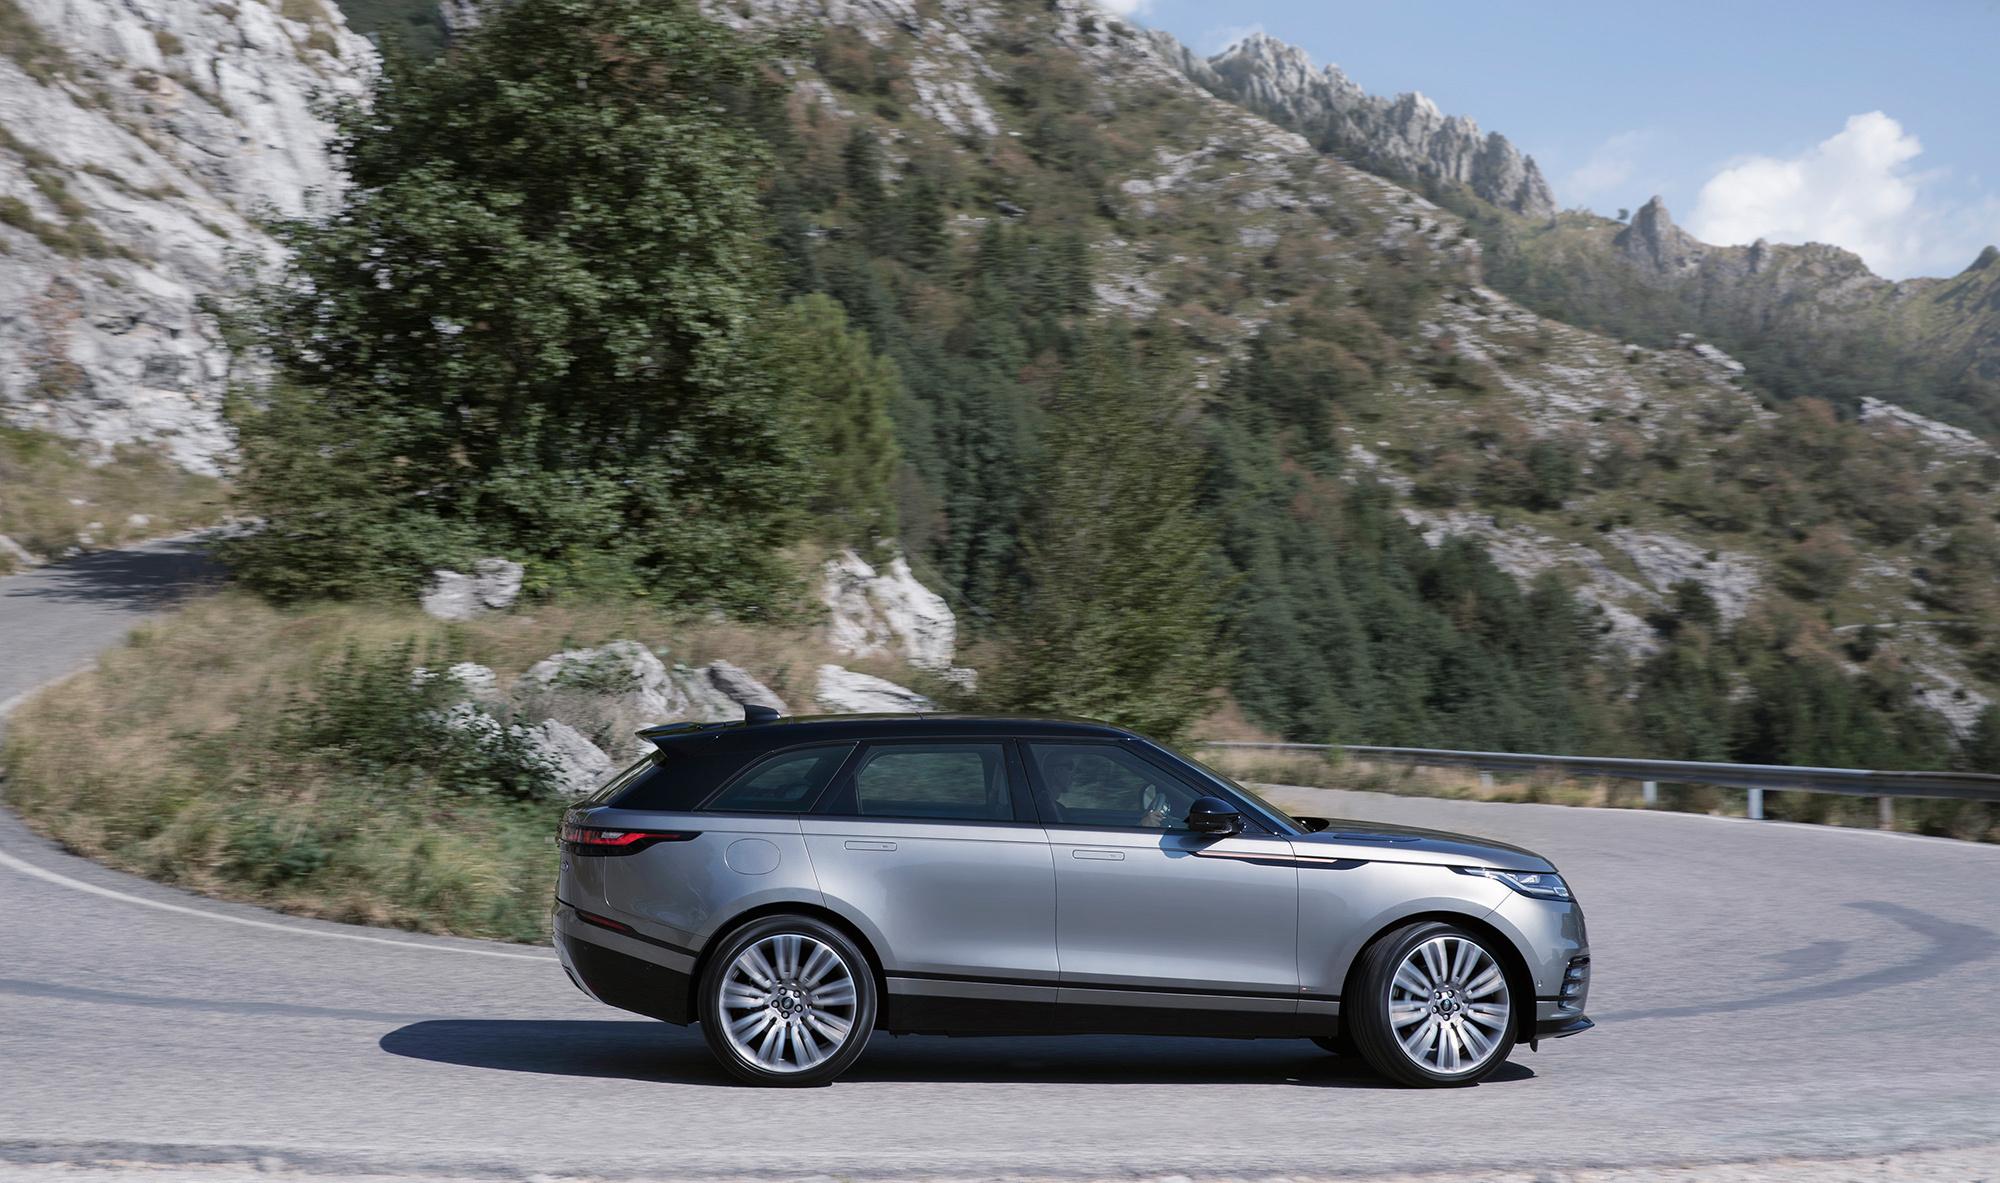 Range Rover Velar Download Free Backgrounds HD